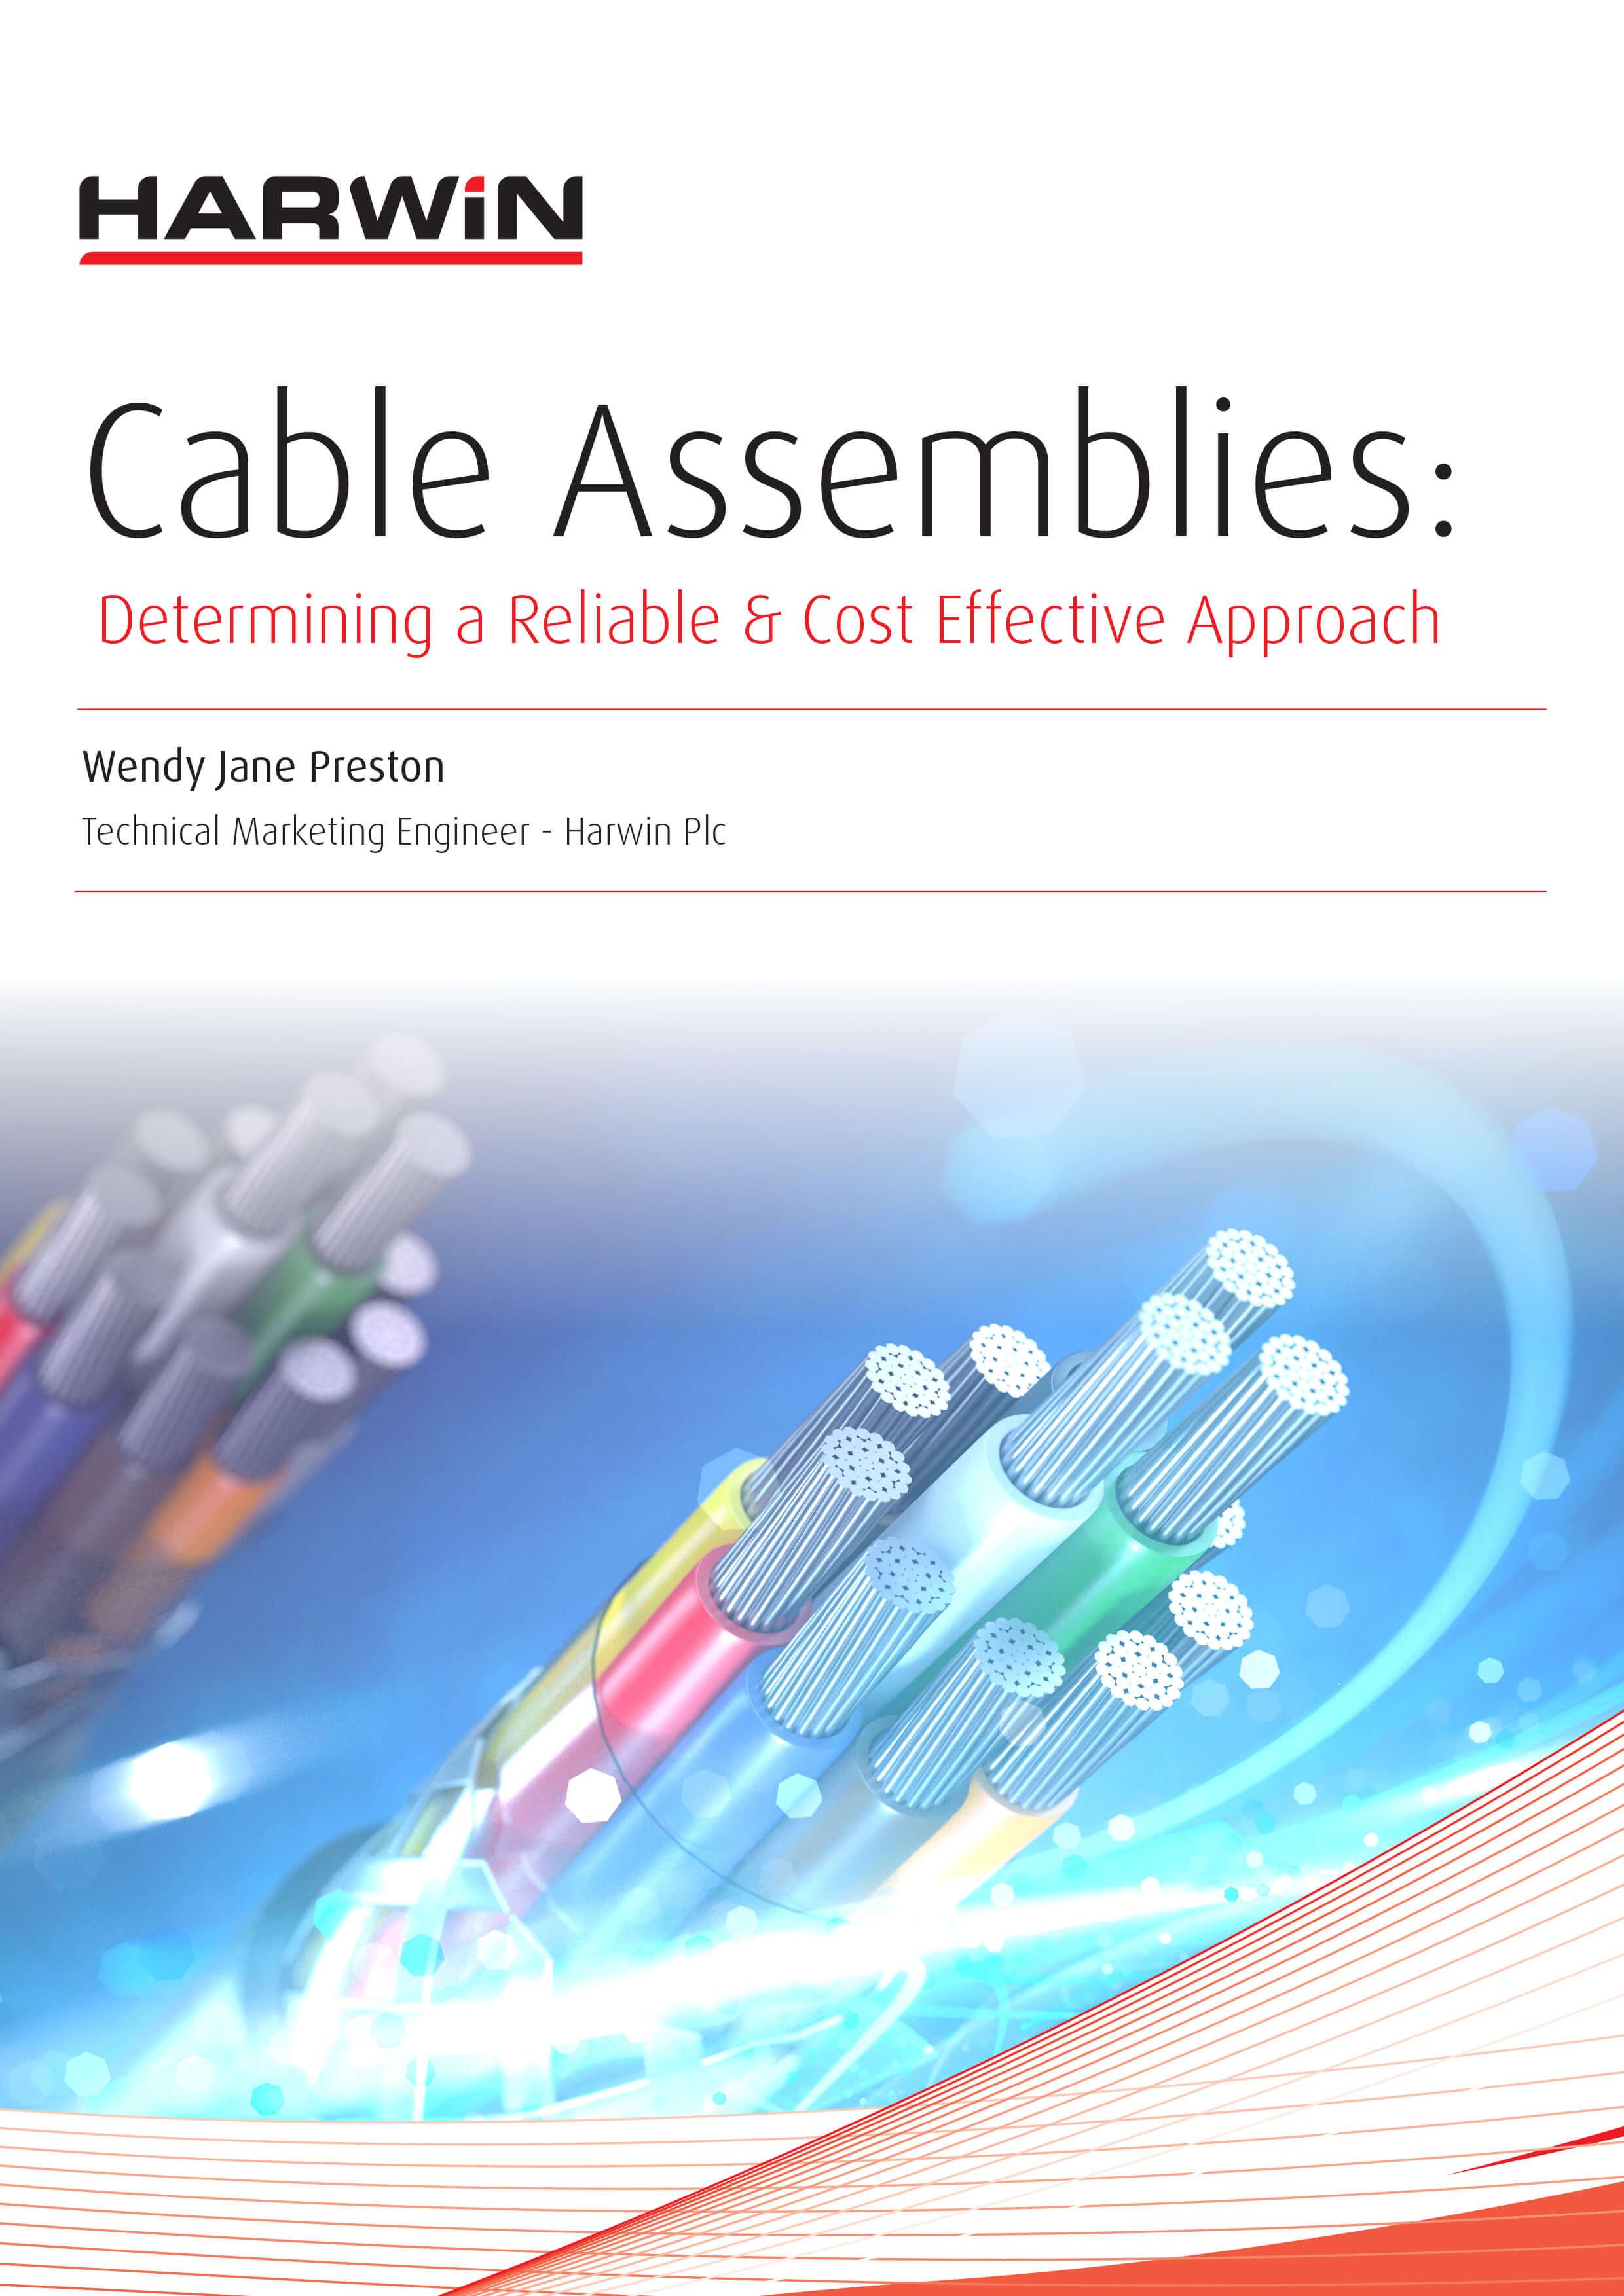 Harwin白皮书-制造结实耐用的电缆组件。